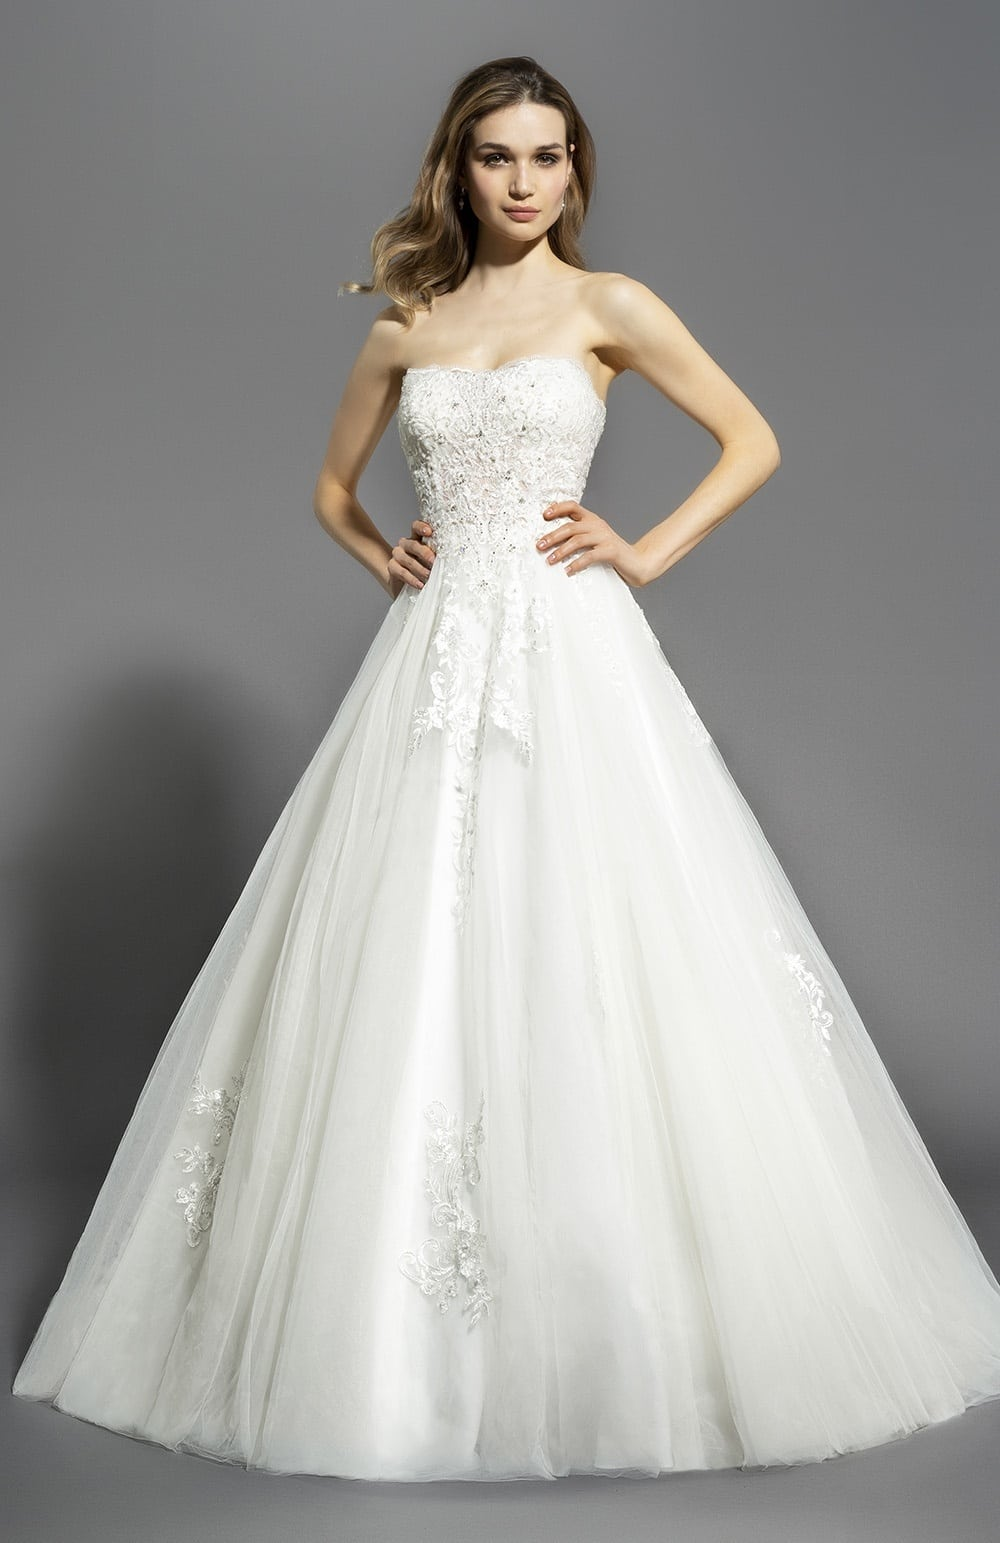 Robe de mariée Modèle Malory